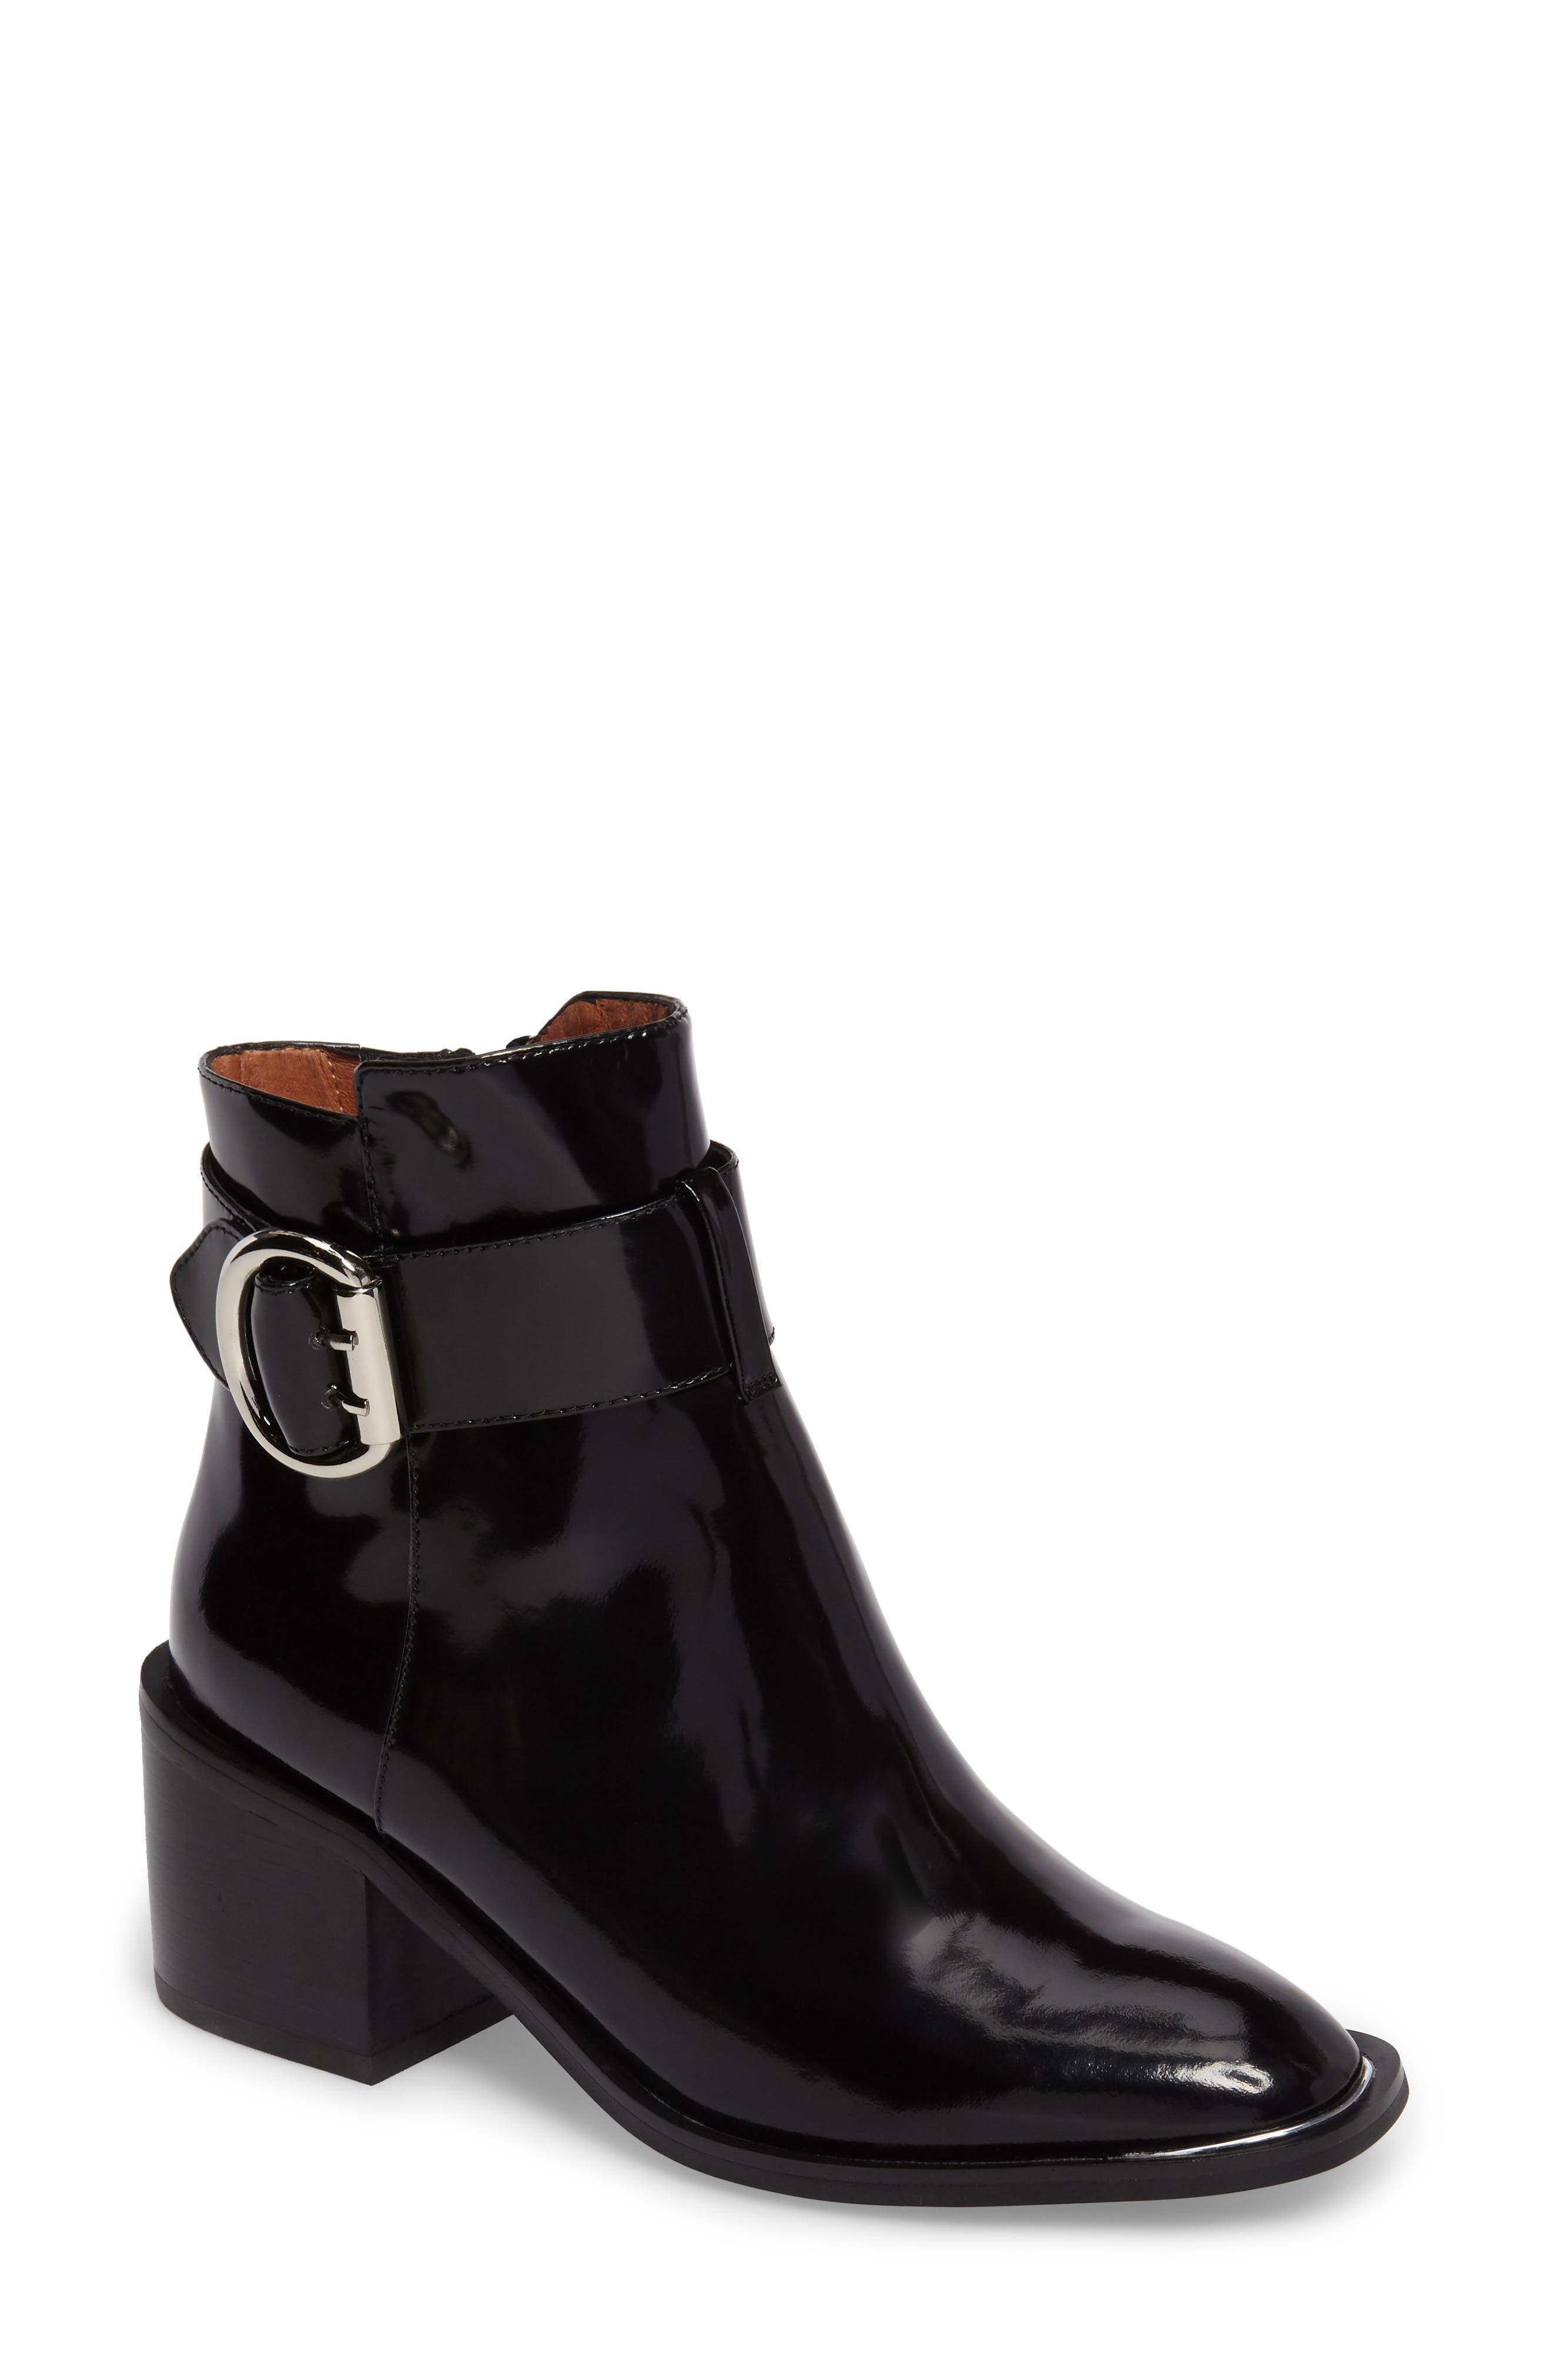 Regan Buckle Strap Bootie,                         Main,                         color, Black Leather